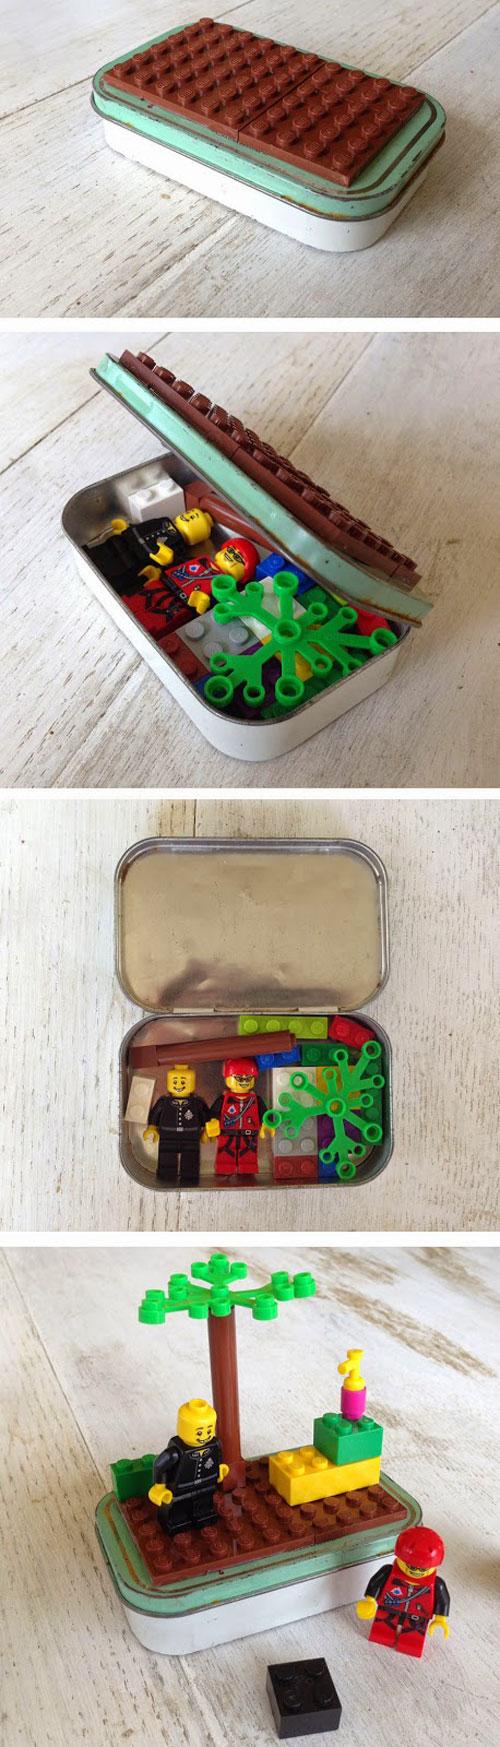 40+ DIY Travel Activities - Lego Set